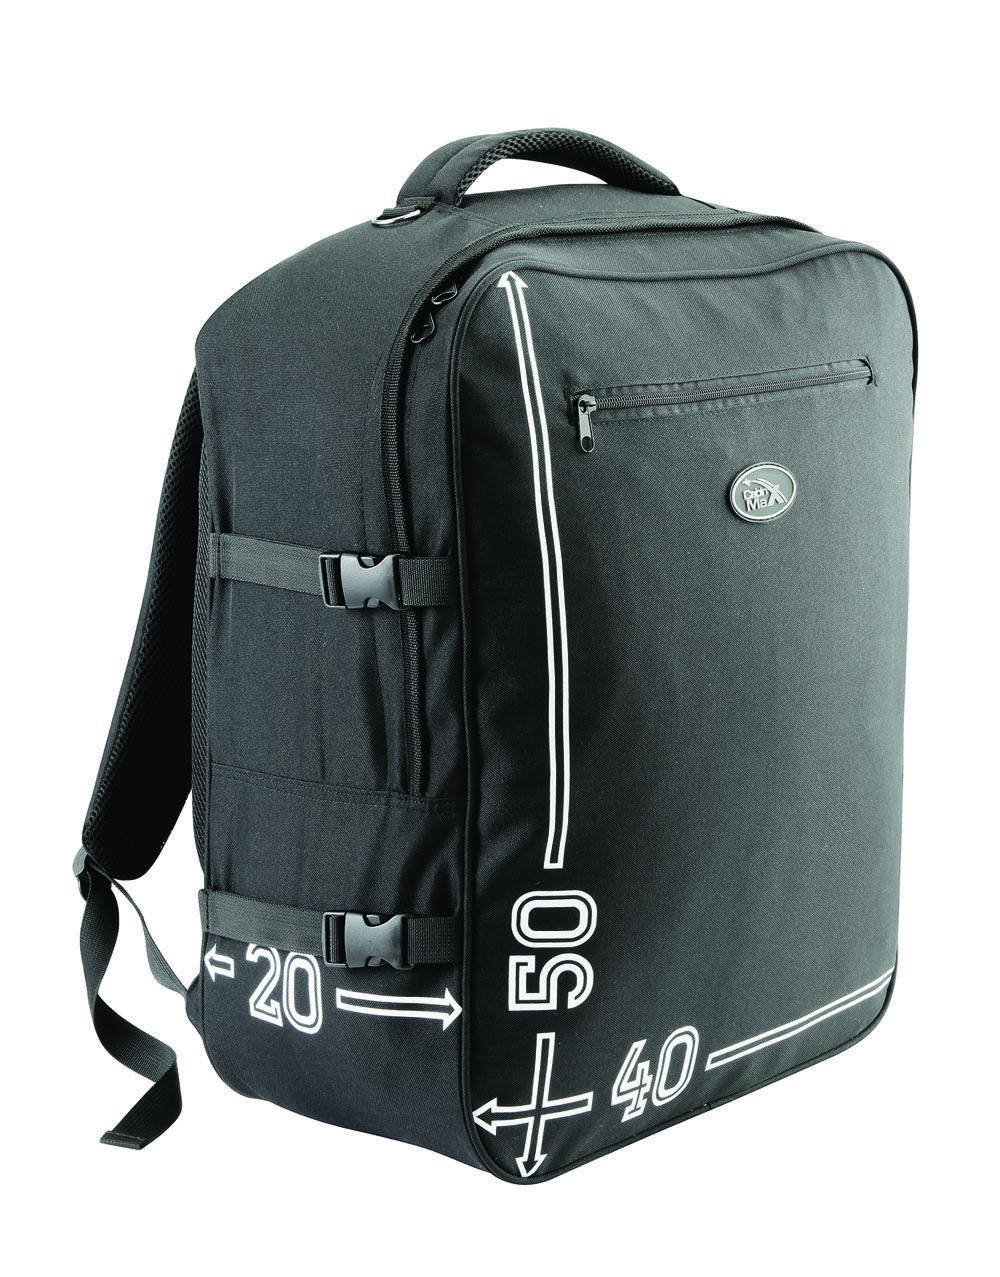 41b7ed897b4f Cabin Max Barcelona 50 x 40 x 20 cm hand luggage backpack (black) Cabin